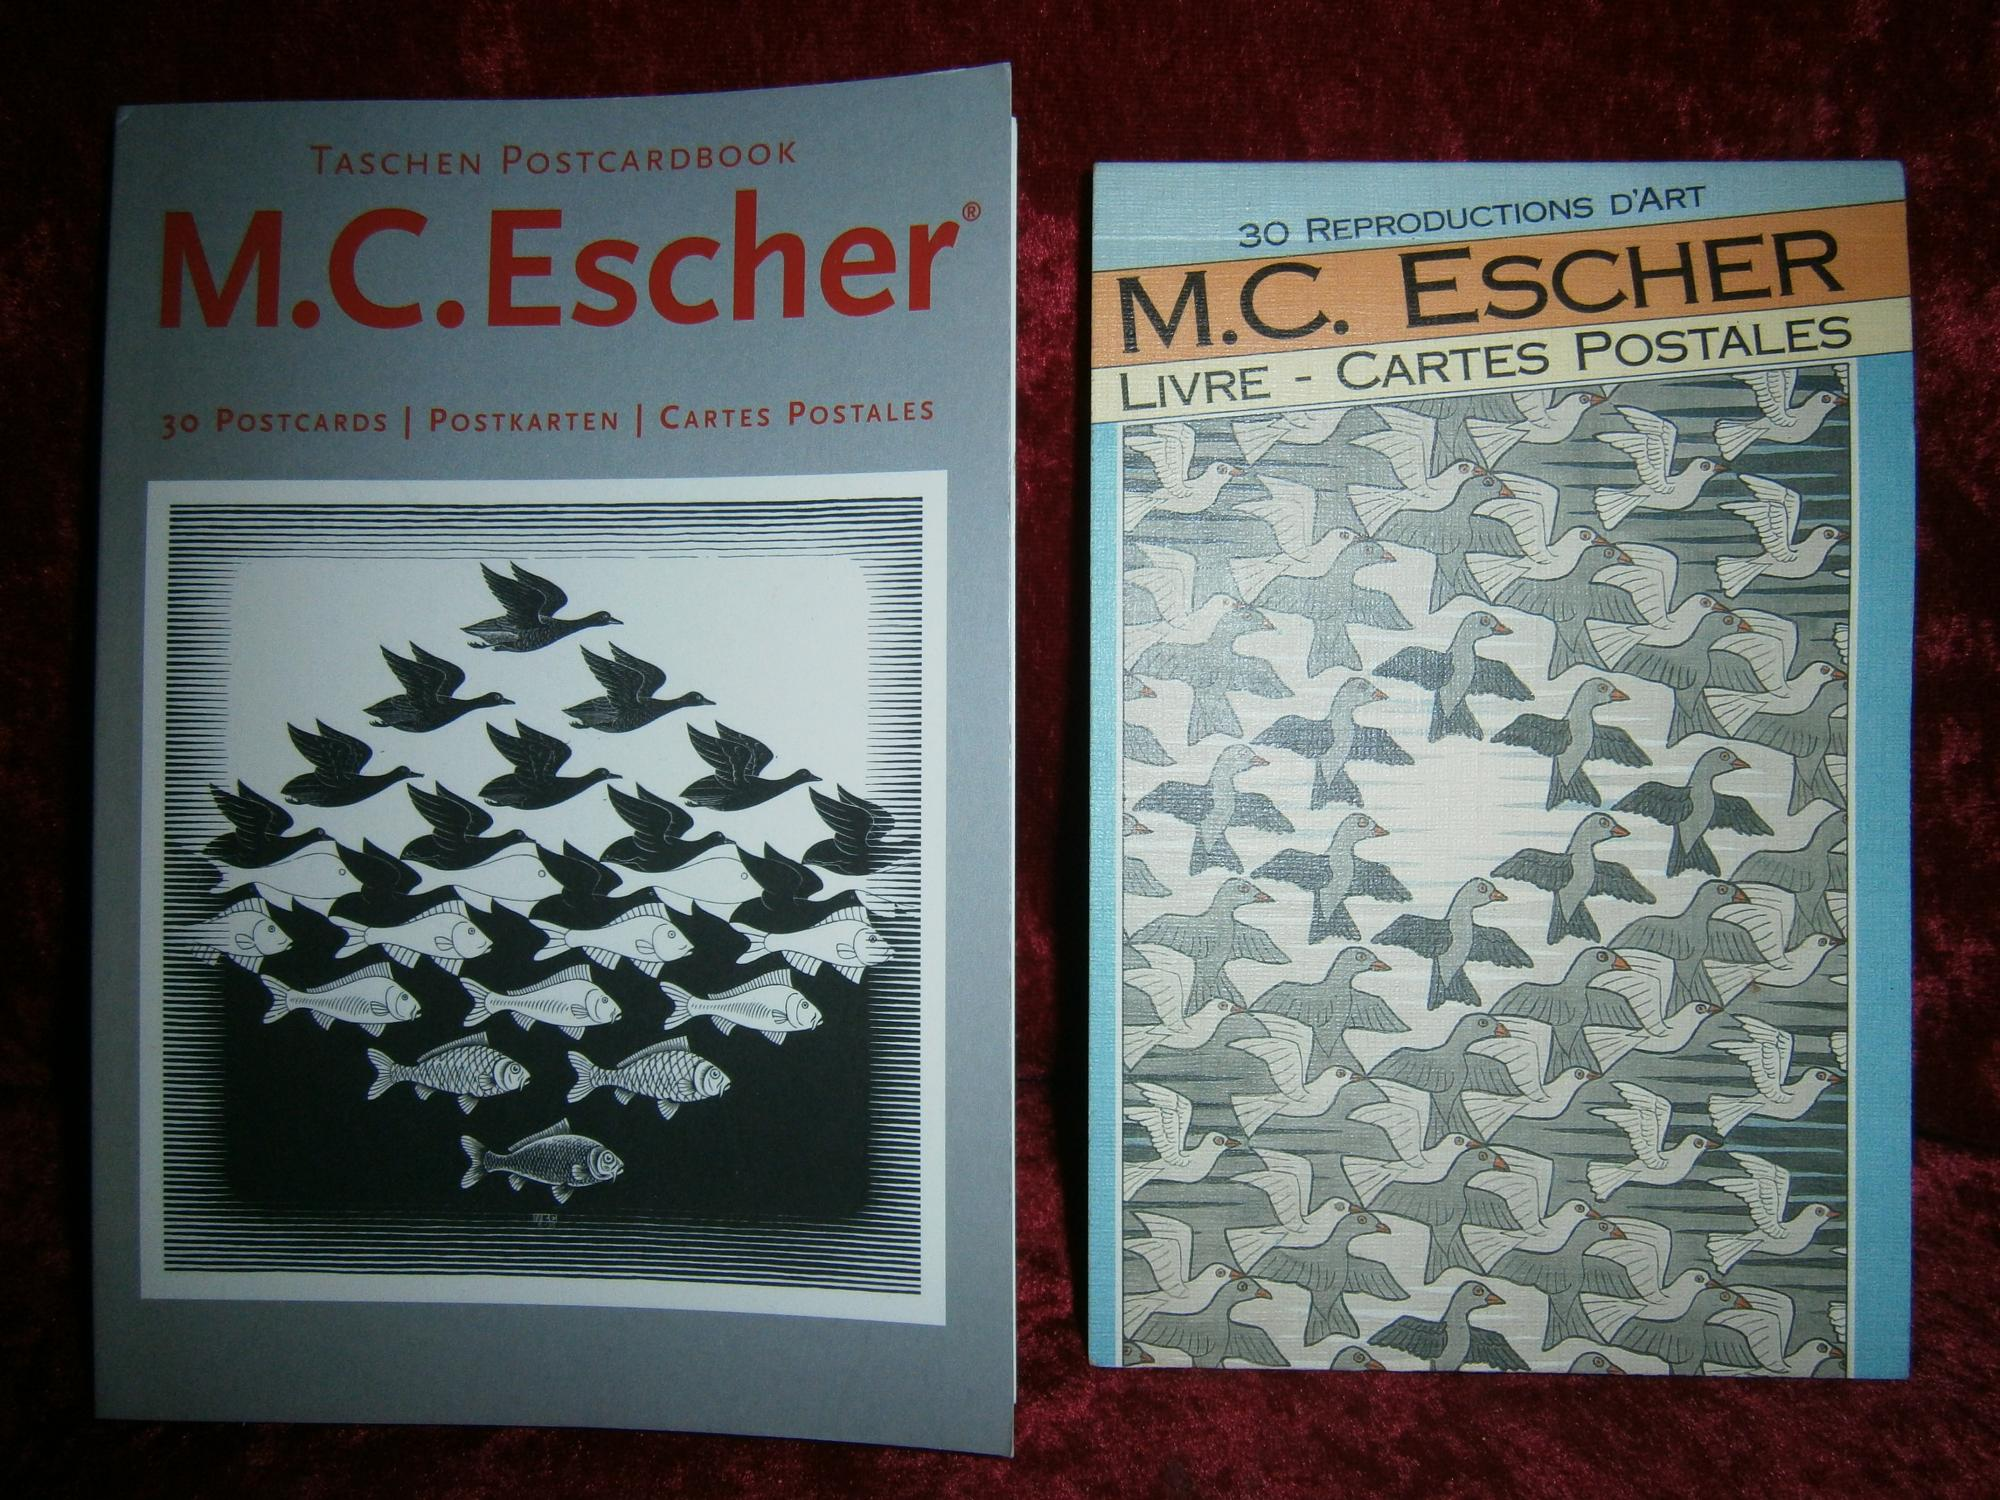 M C Escher Postcardbook 30 Postcards